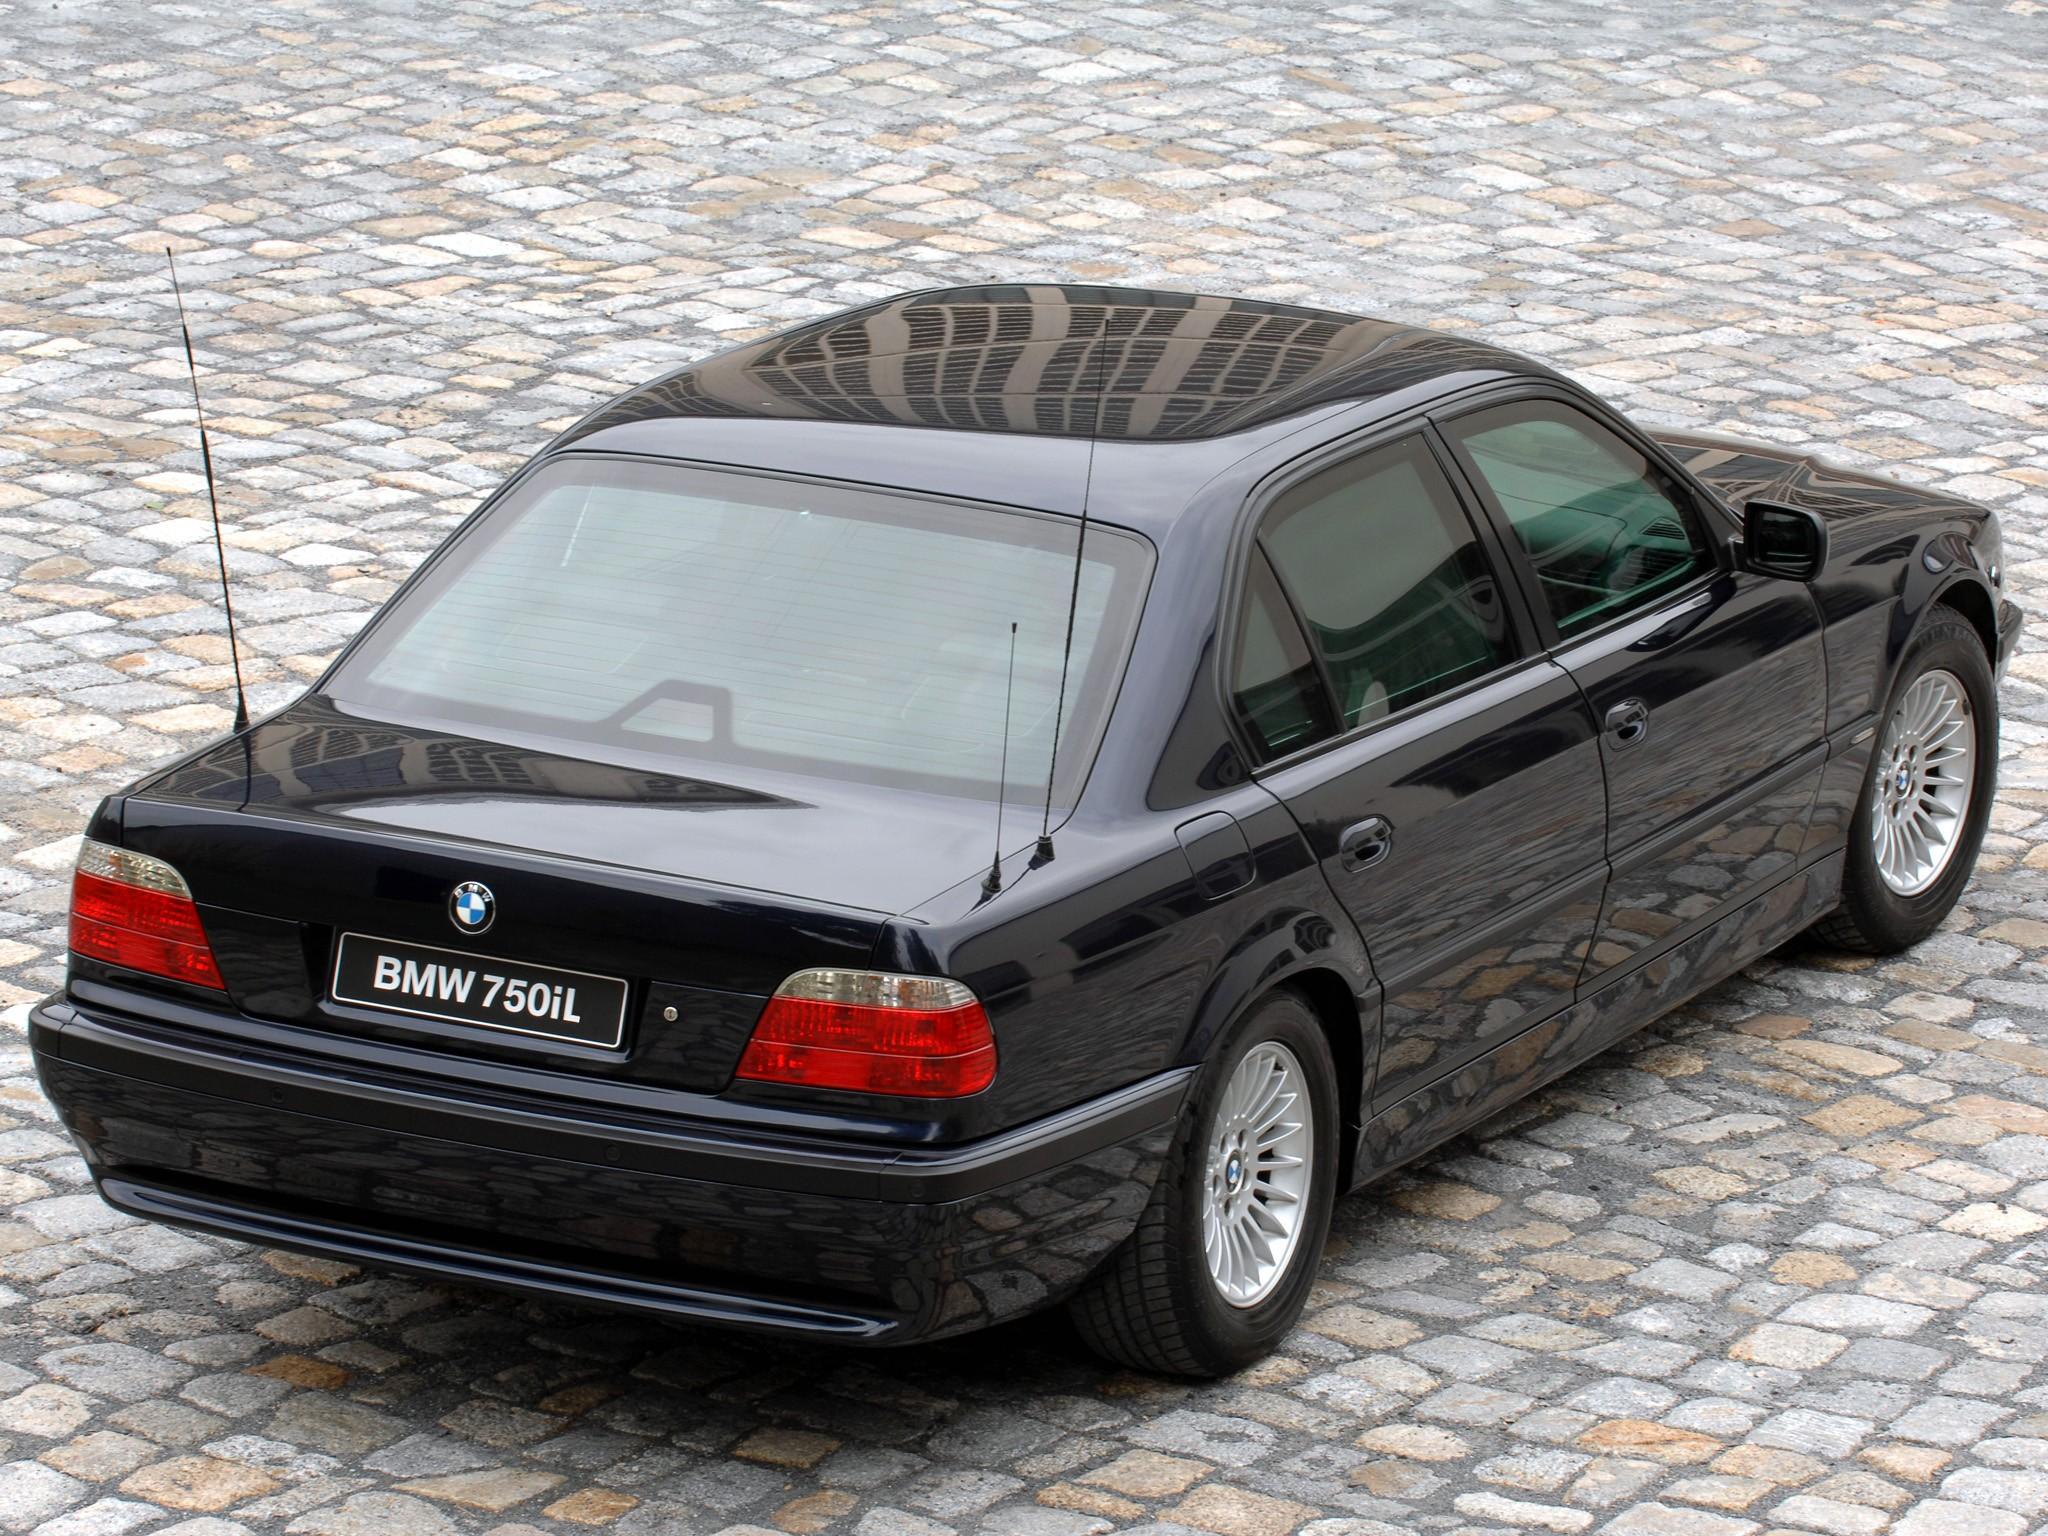 bmw 7 series e38 1998 1999 2000 2001 autoevolution. Black Bedroom Furniture Sets. Home Design Ideas